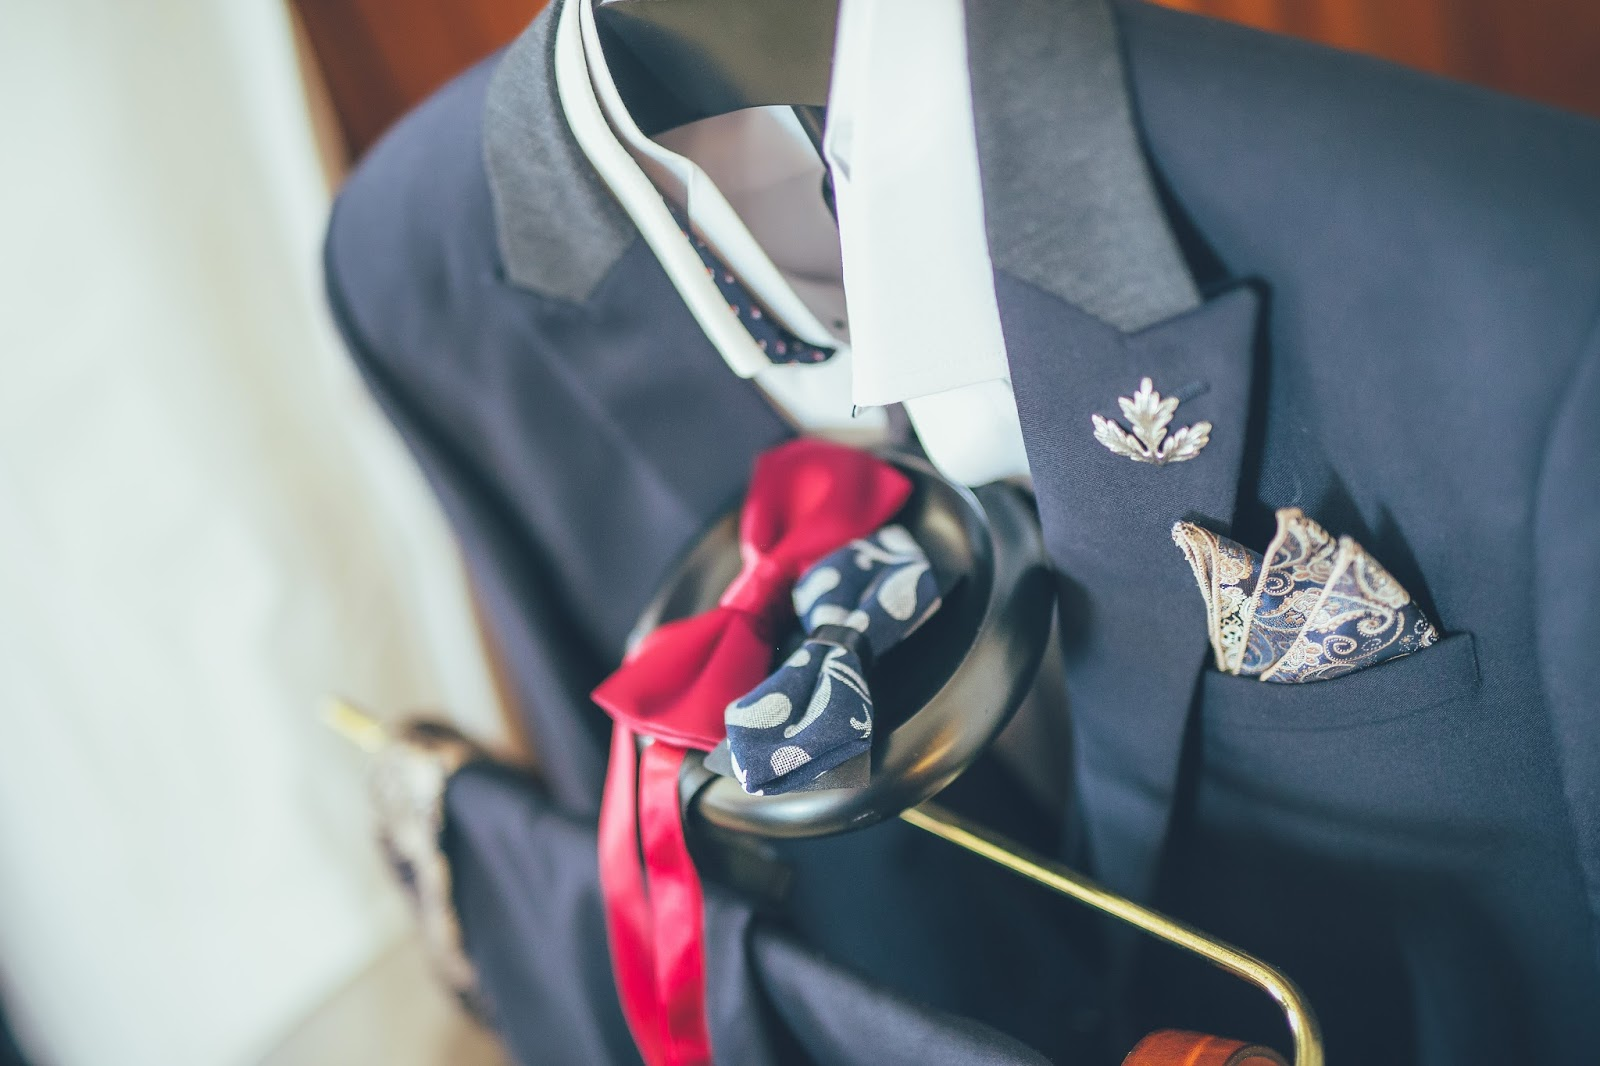 Venta 話來畫趣: [wedding] 新郎也要帥帥的,西裝&配件哪裡買? (含自製伴郎胸針)